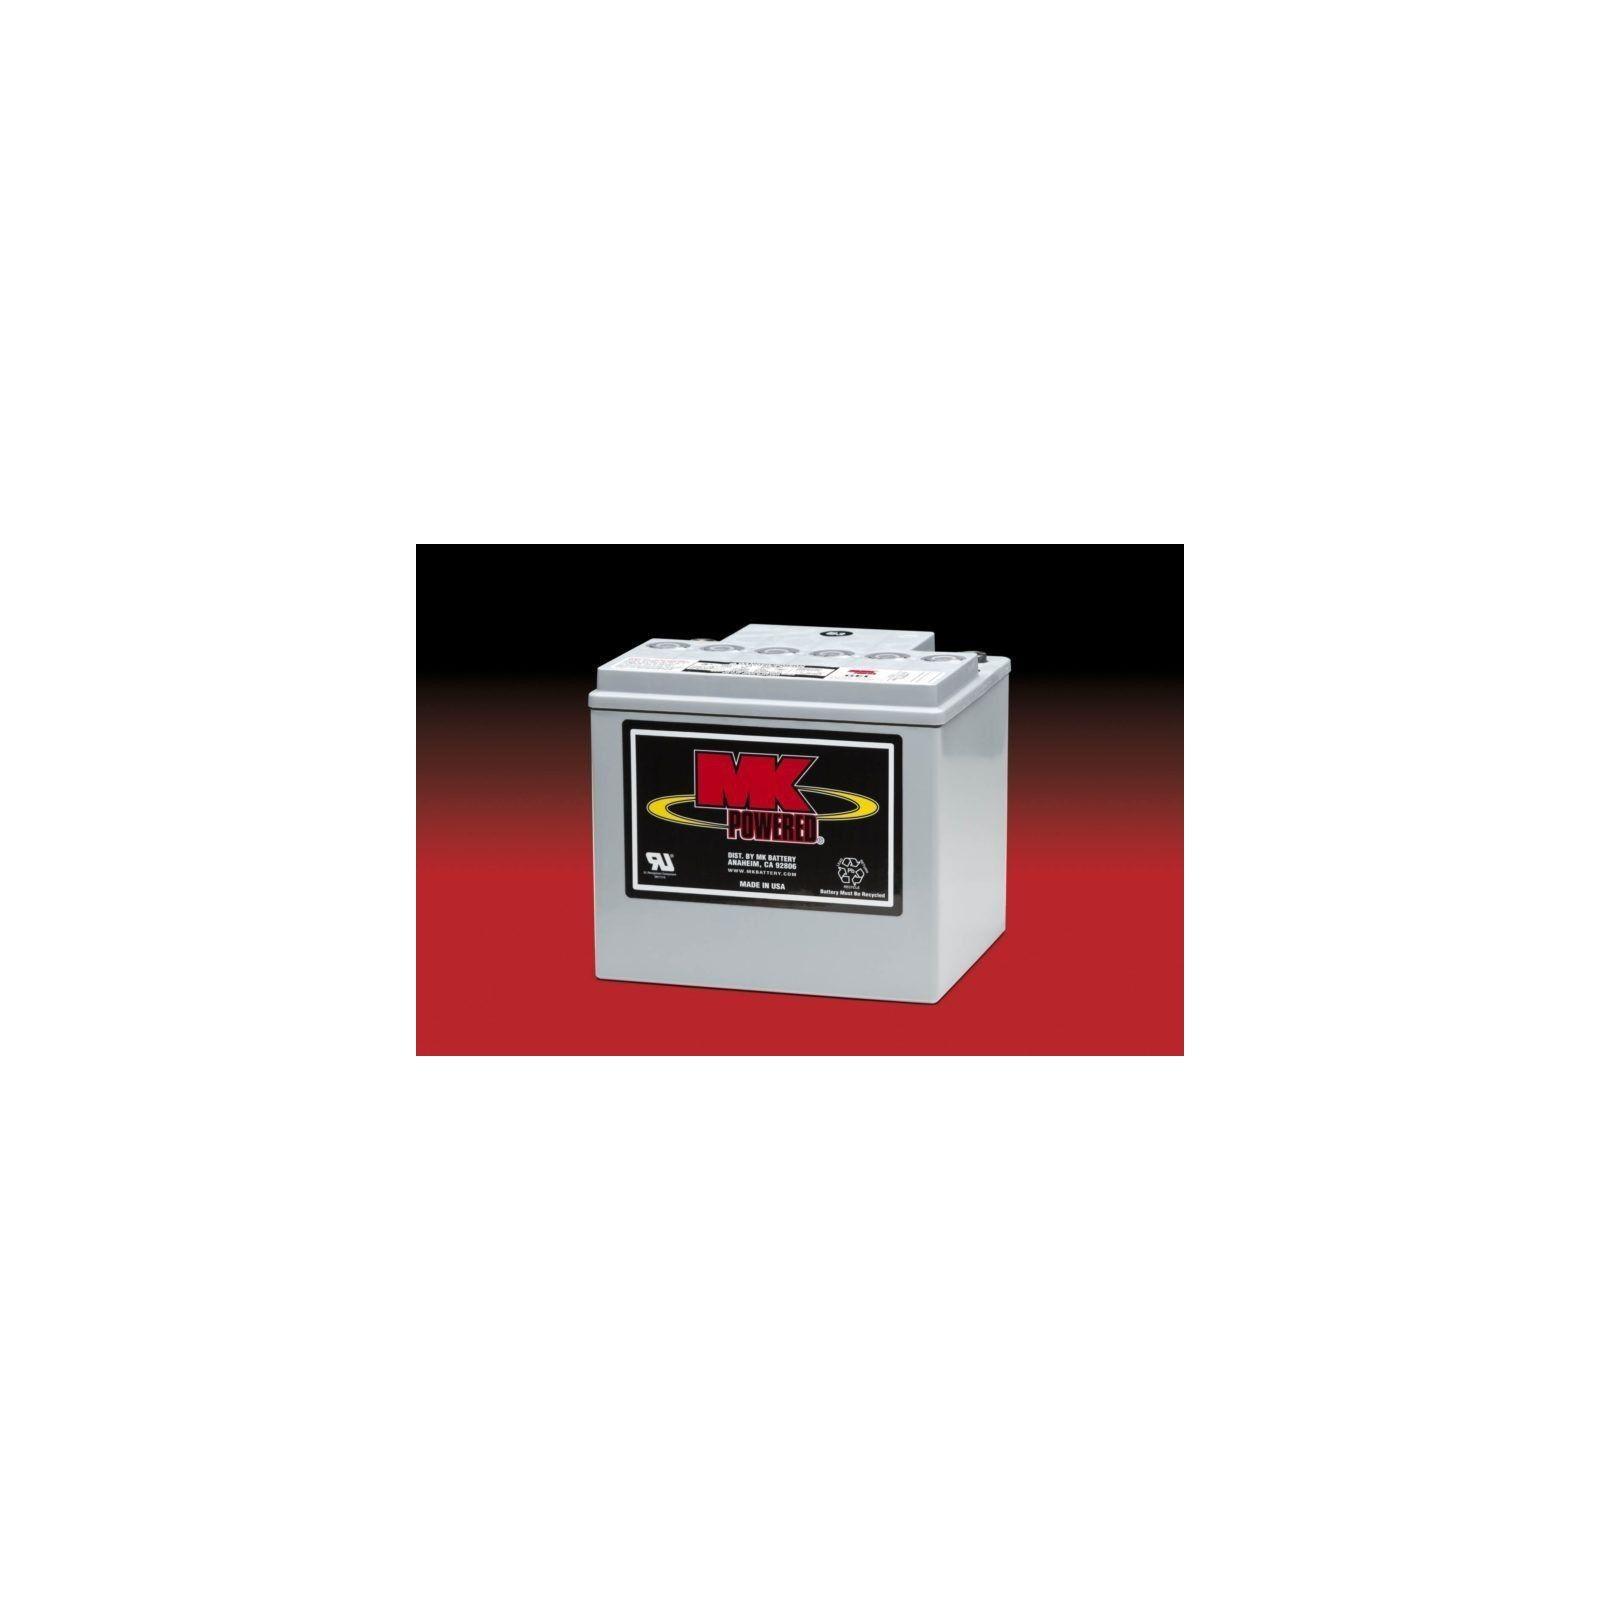 Batería MK 8G40 40Ah 12V Gel MK - 1